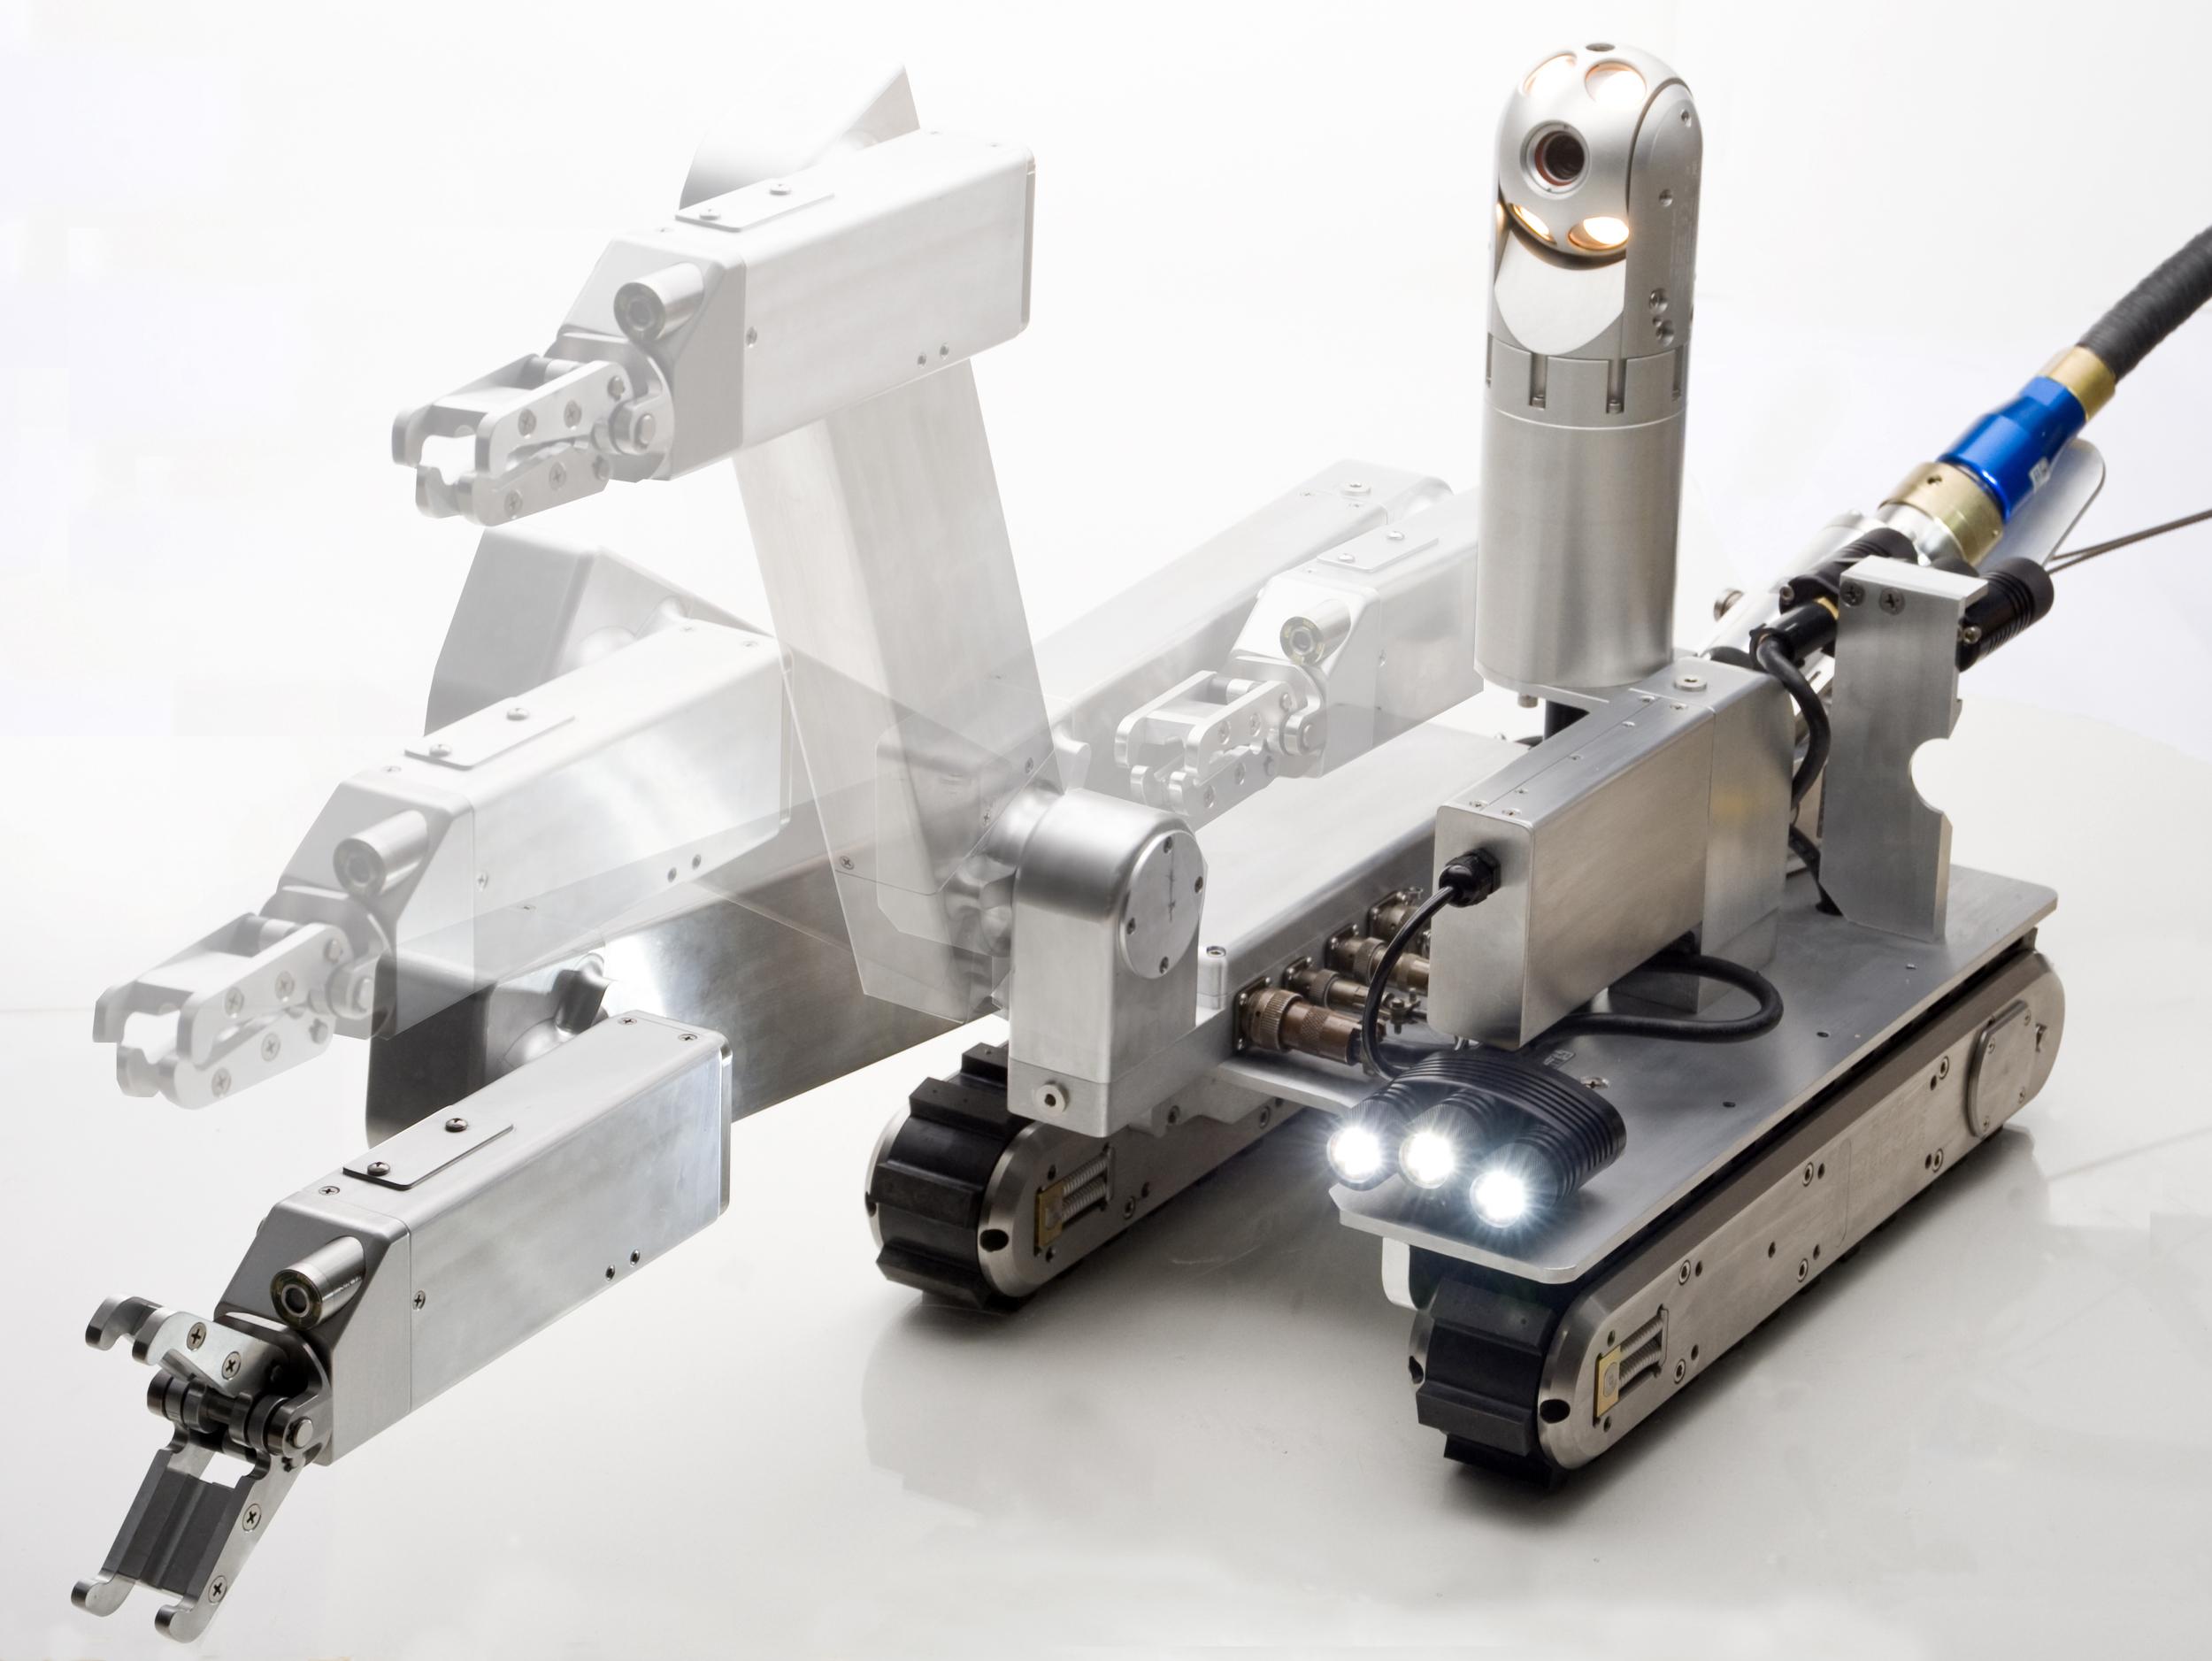 Inuktun Versatrax 450™ FOSAR Crawler